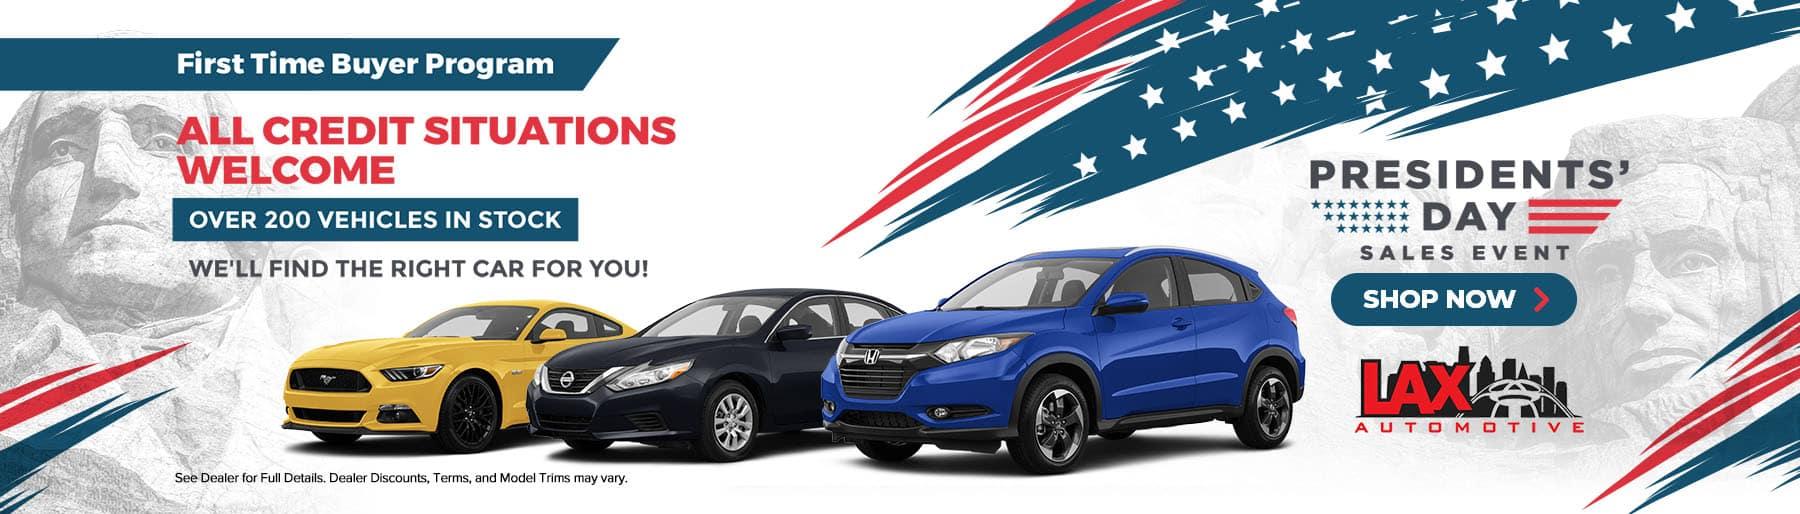 2021-02-Lax Automotive _Slide-1800×514 – First Time Buyer Program